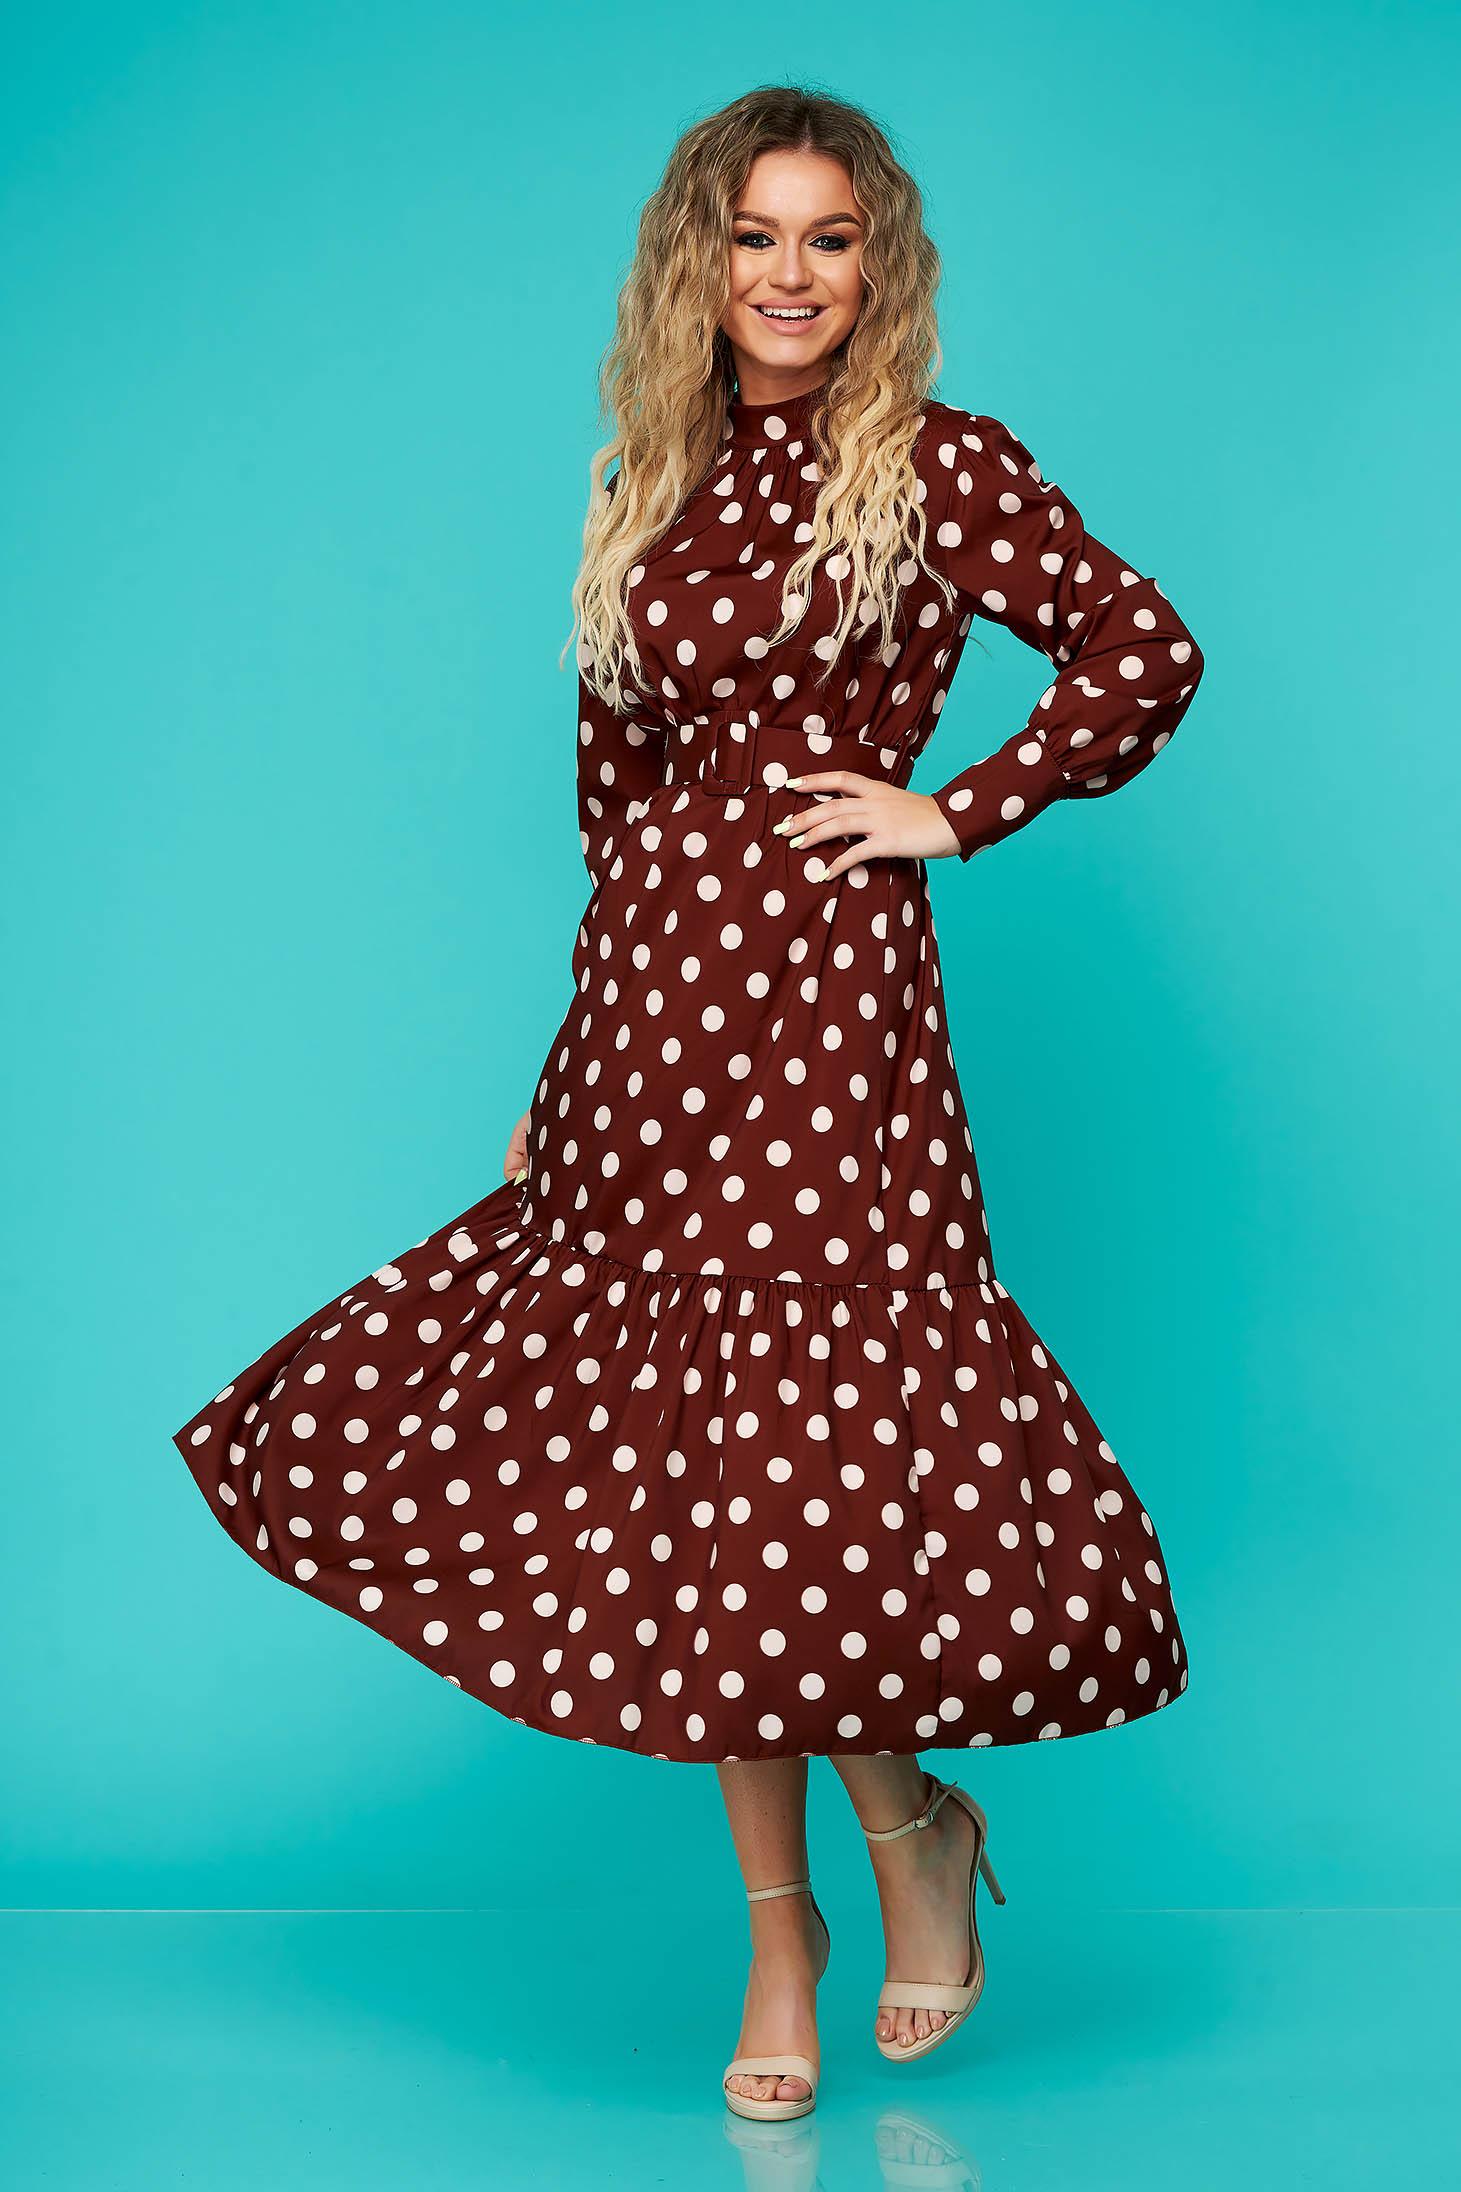 Rochie SunShine maro de zi midi cu elastic in talie cu accesoriu tip curea cu volanase la baza rochiei